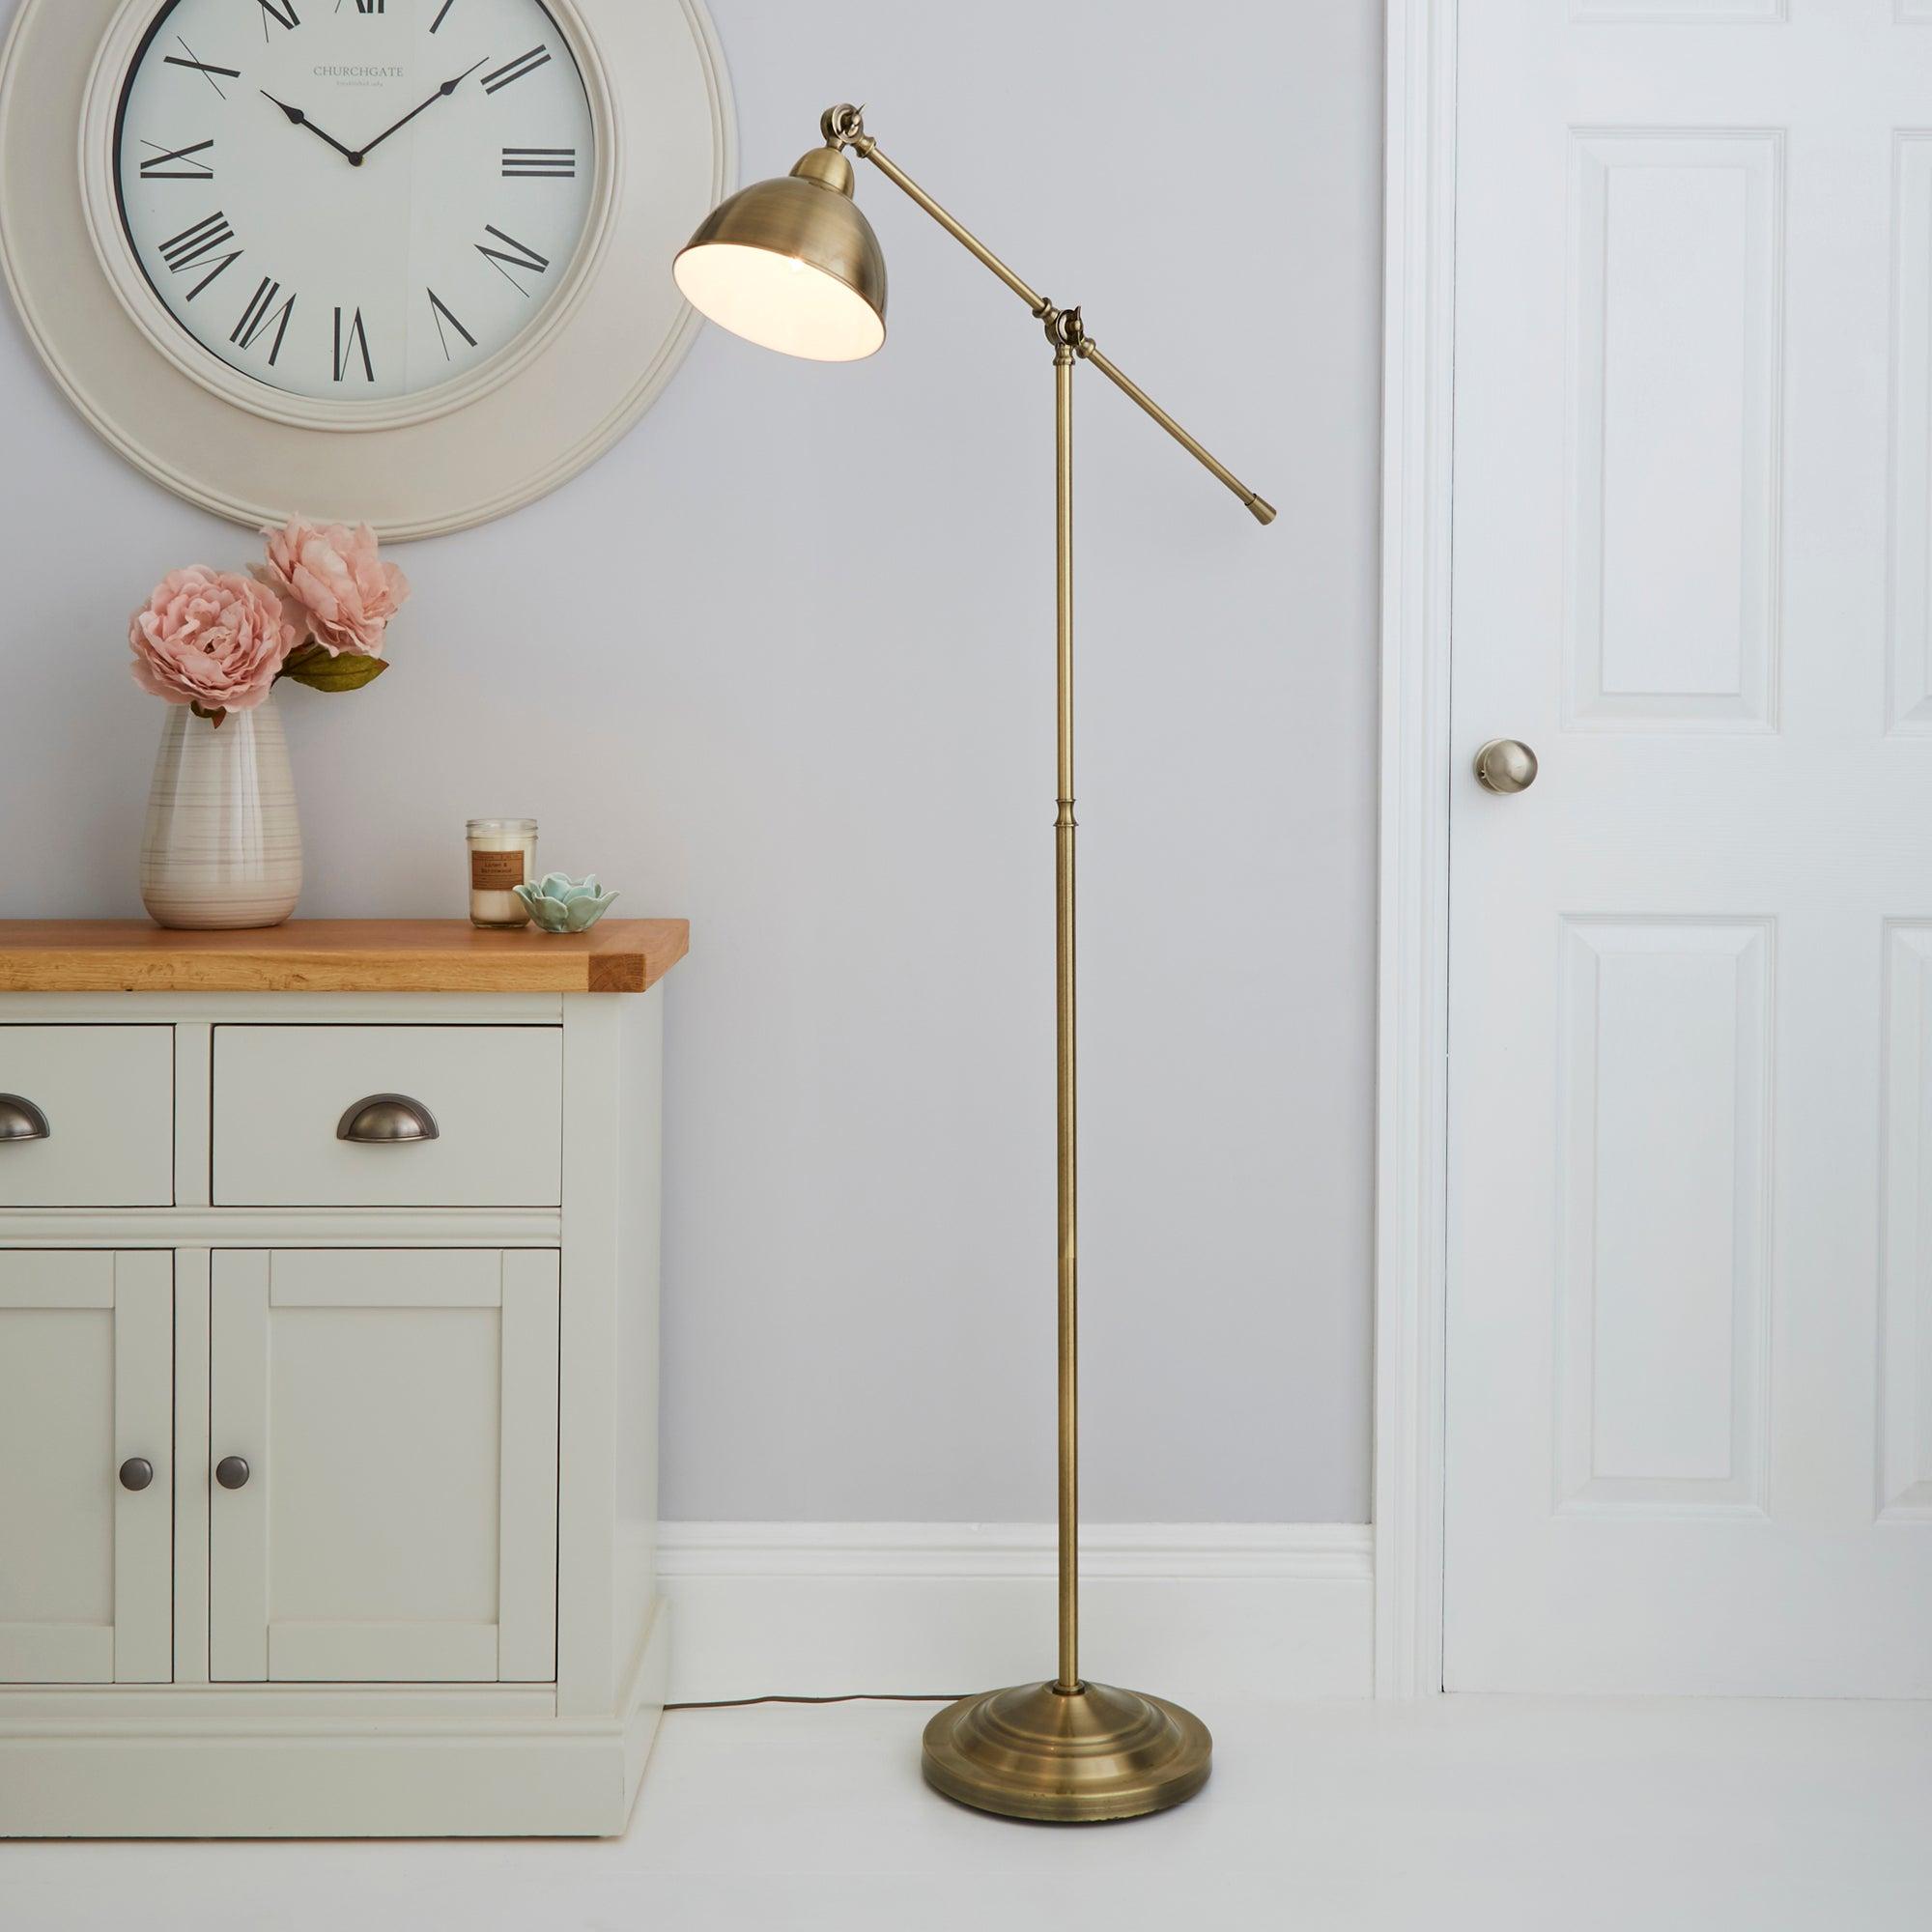 Lever Arm Antique Brass Floor Lamp Bronze